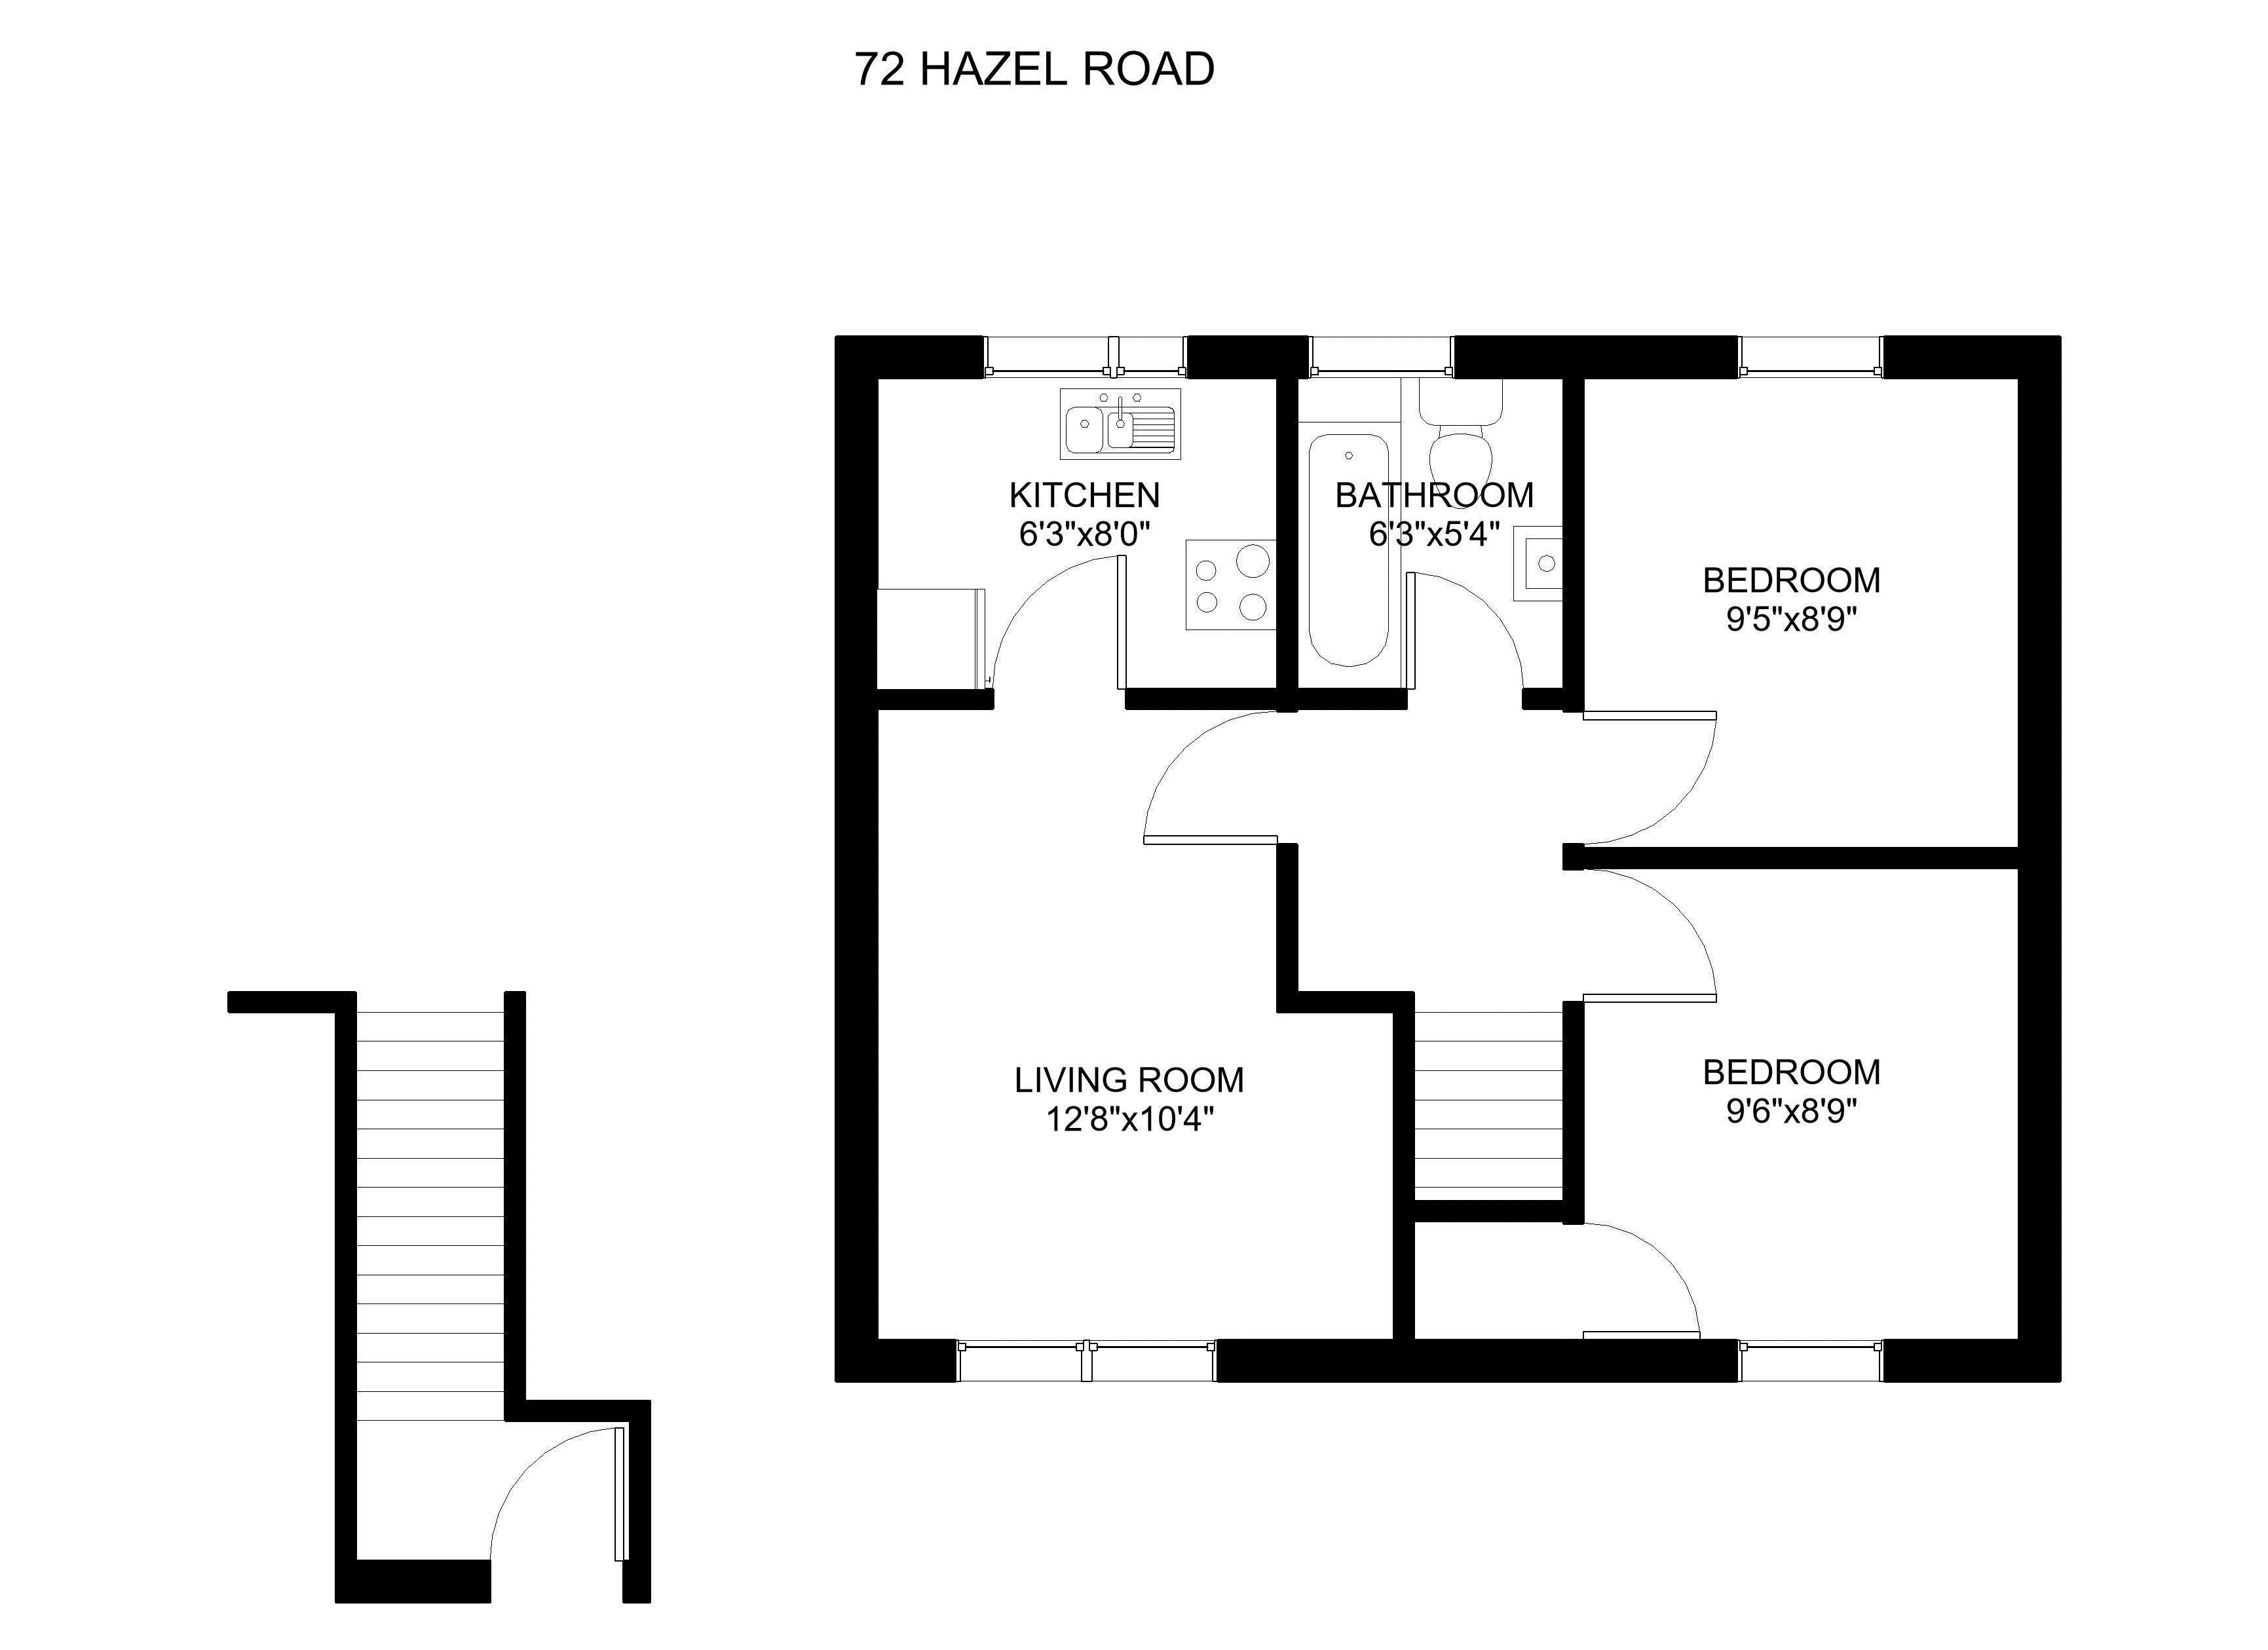 72 Hazel Road Floorplan